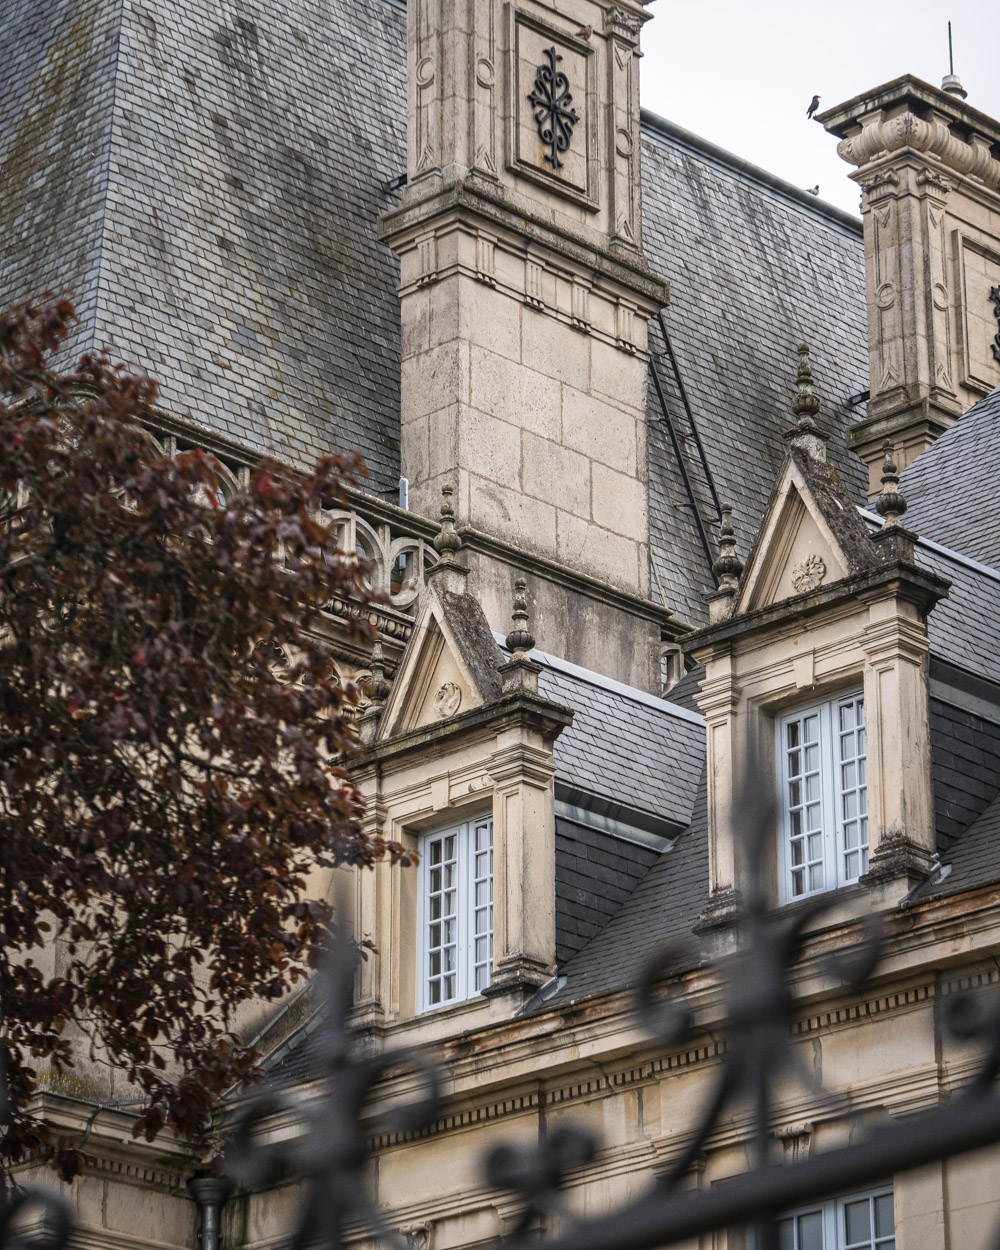 Château de Brochon Stéphen Liégeard Dijon Bourgogne